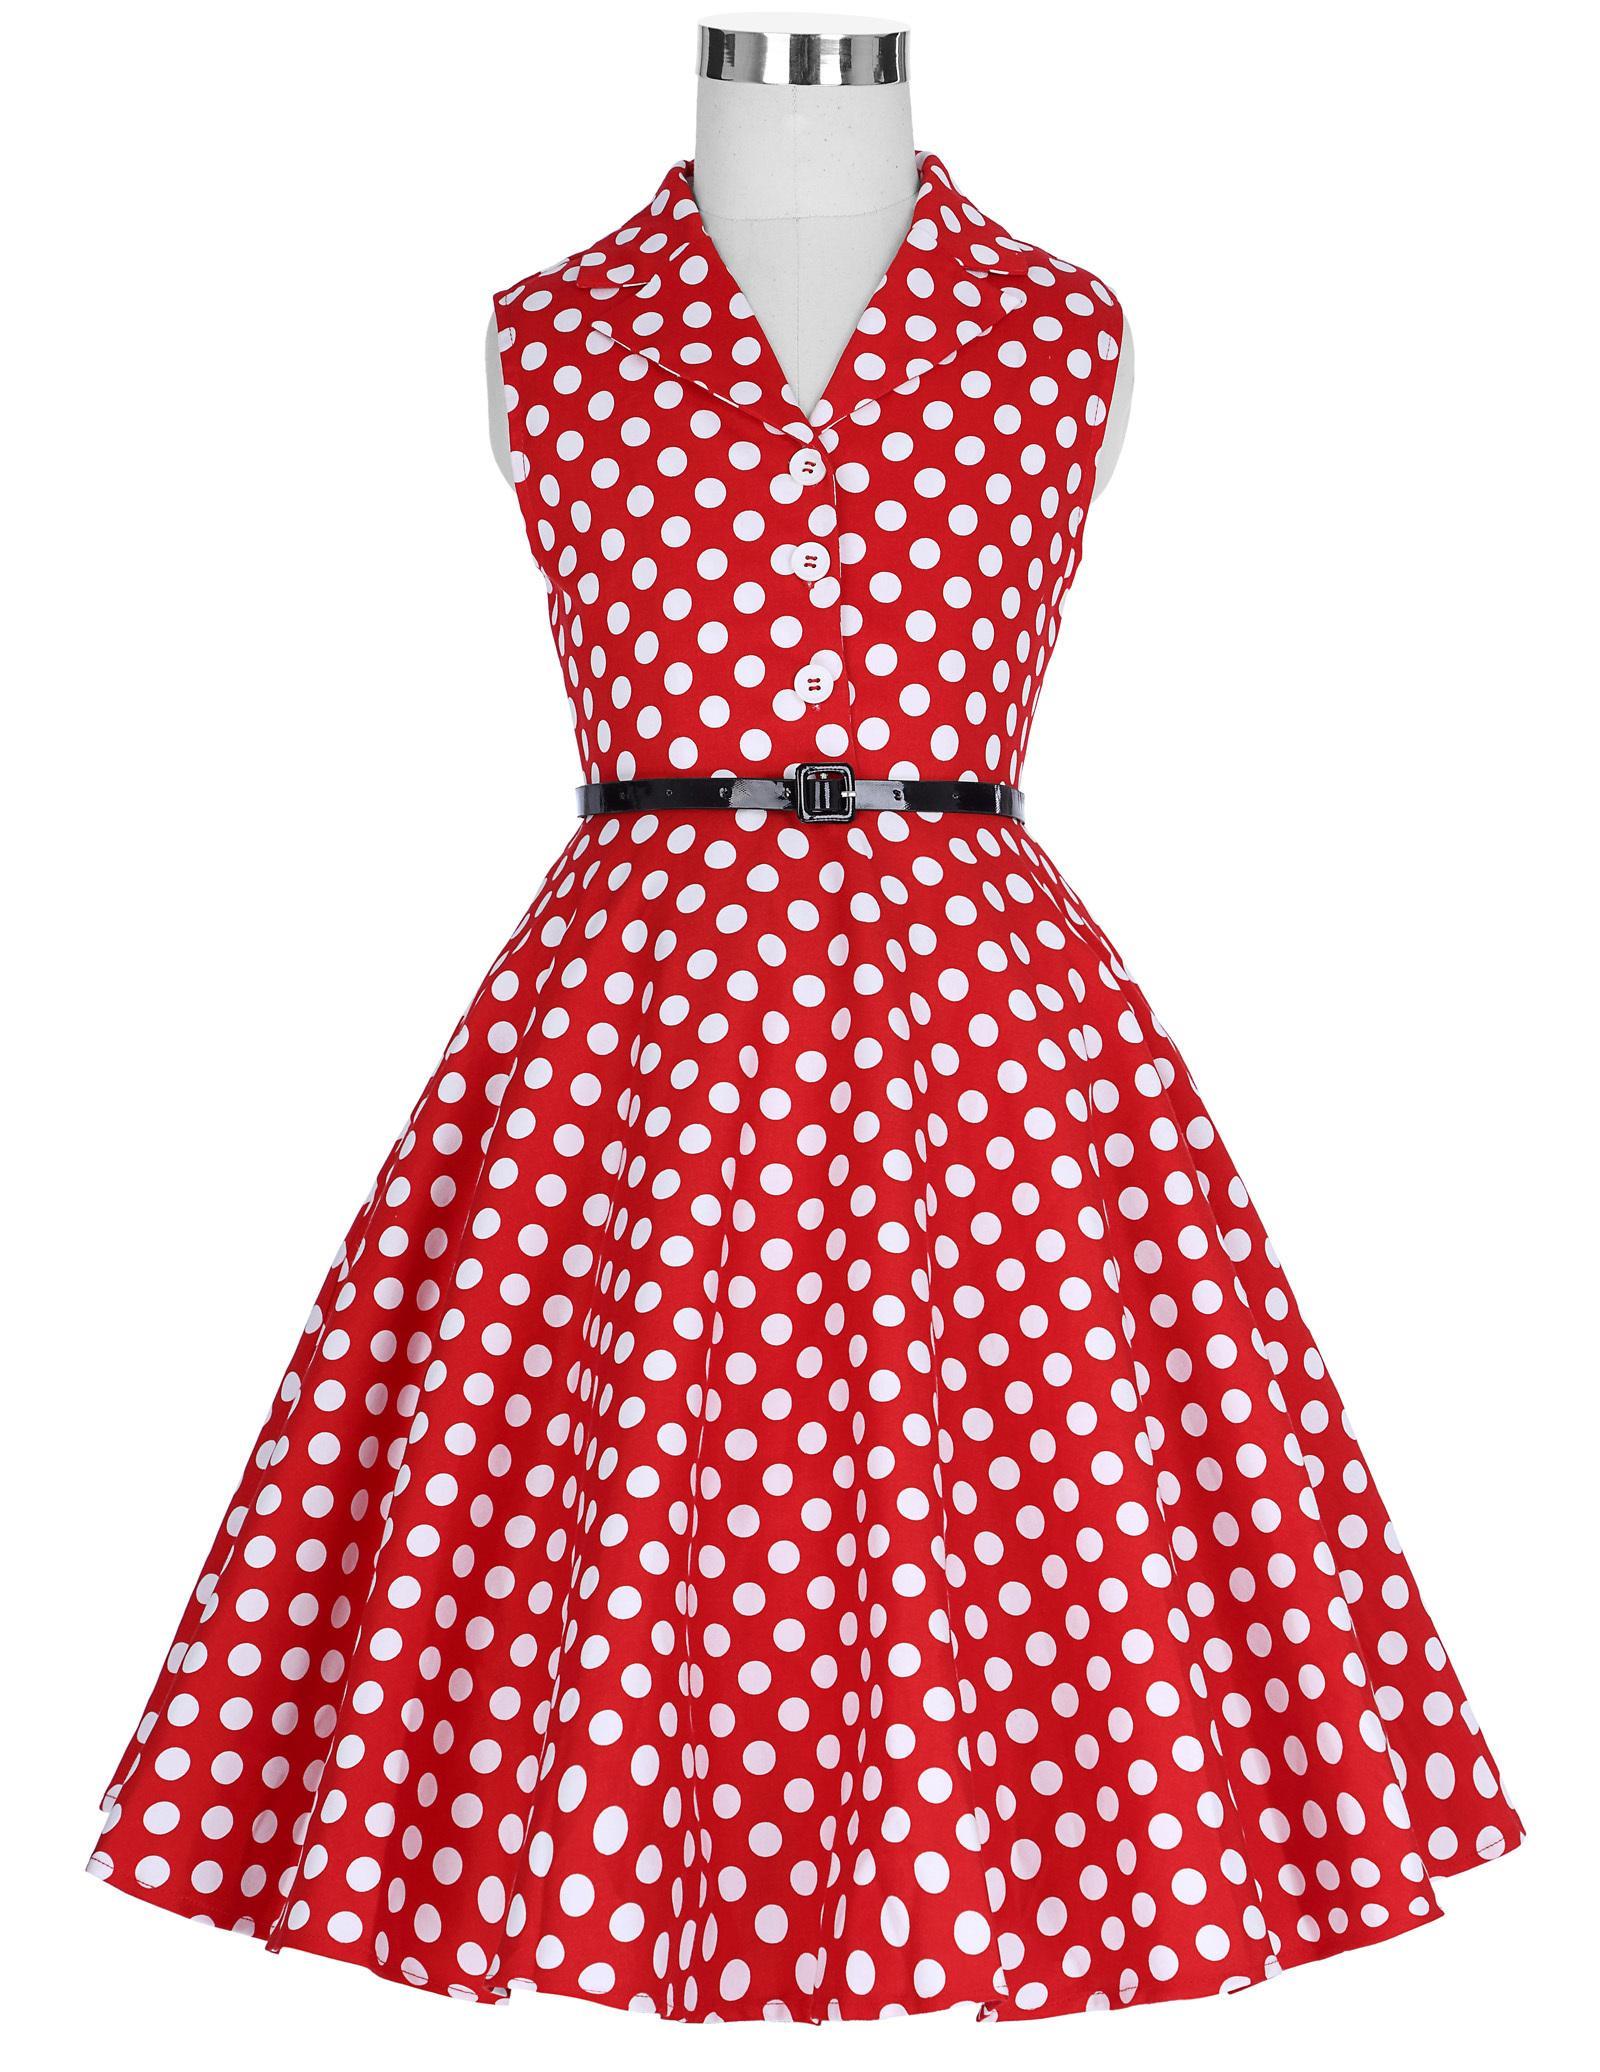 New Children Kids Girls Retro Vintage Sleeveless Lapel Collar Polka Dots Dress Y190516